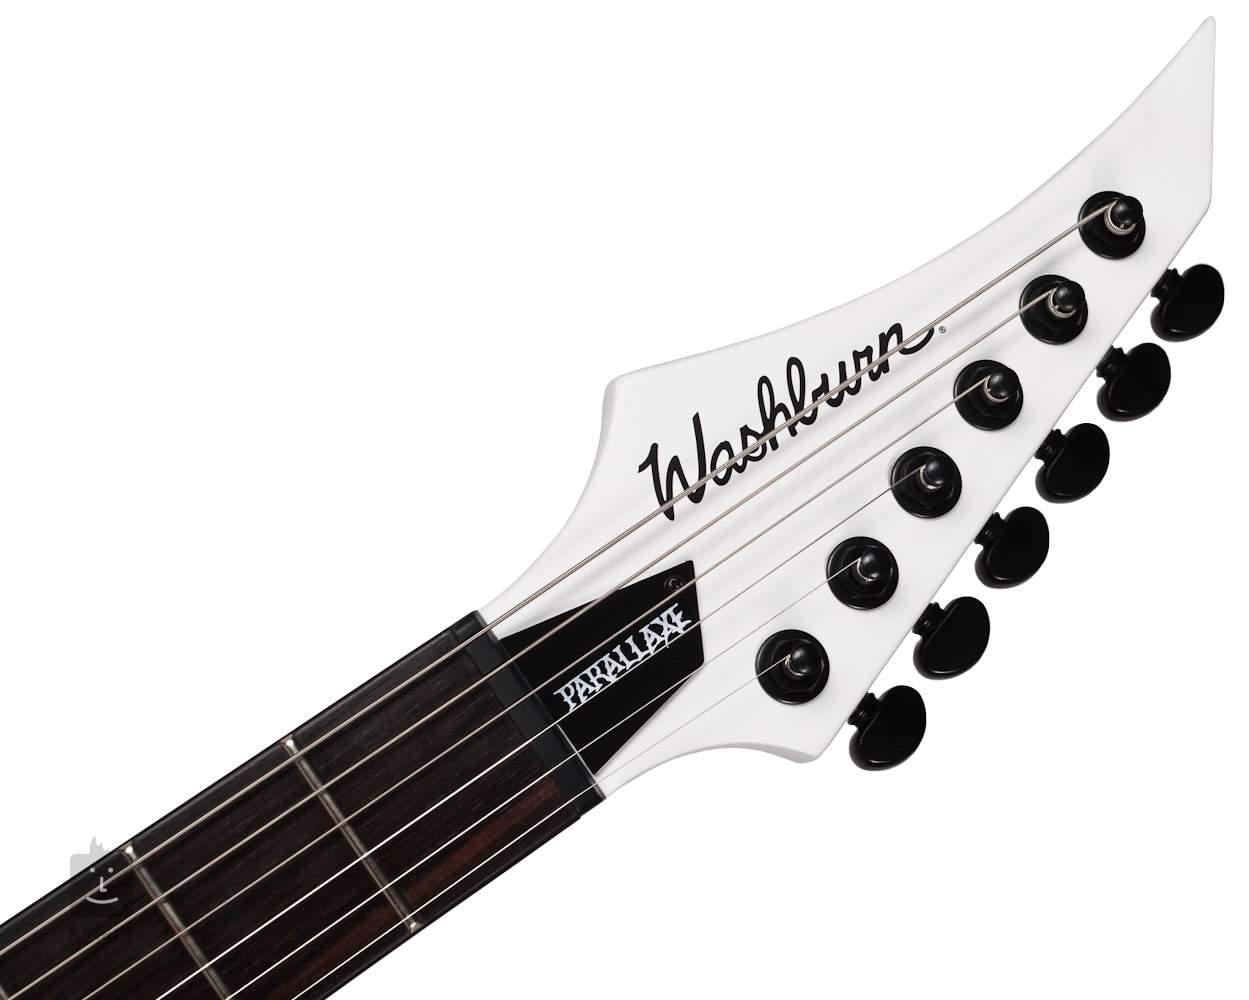 washburn parallaxe px solarv160whmk elektrick kytara. Black Bedroom Furniture Sets. Home Design Ideas